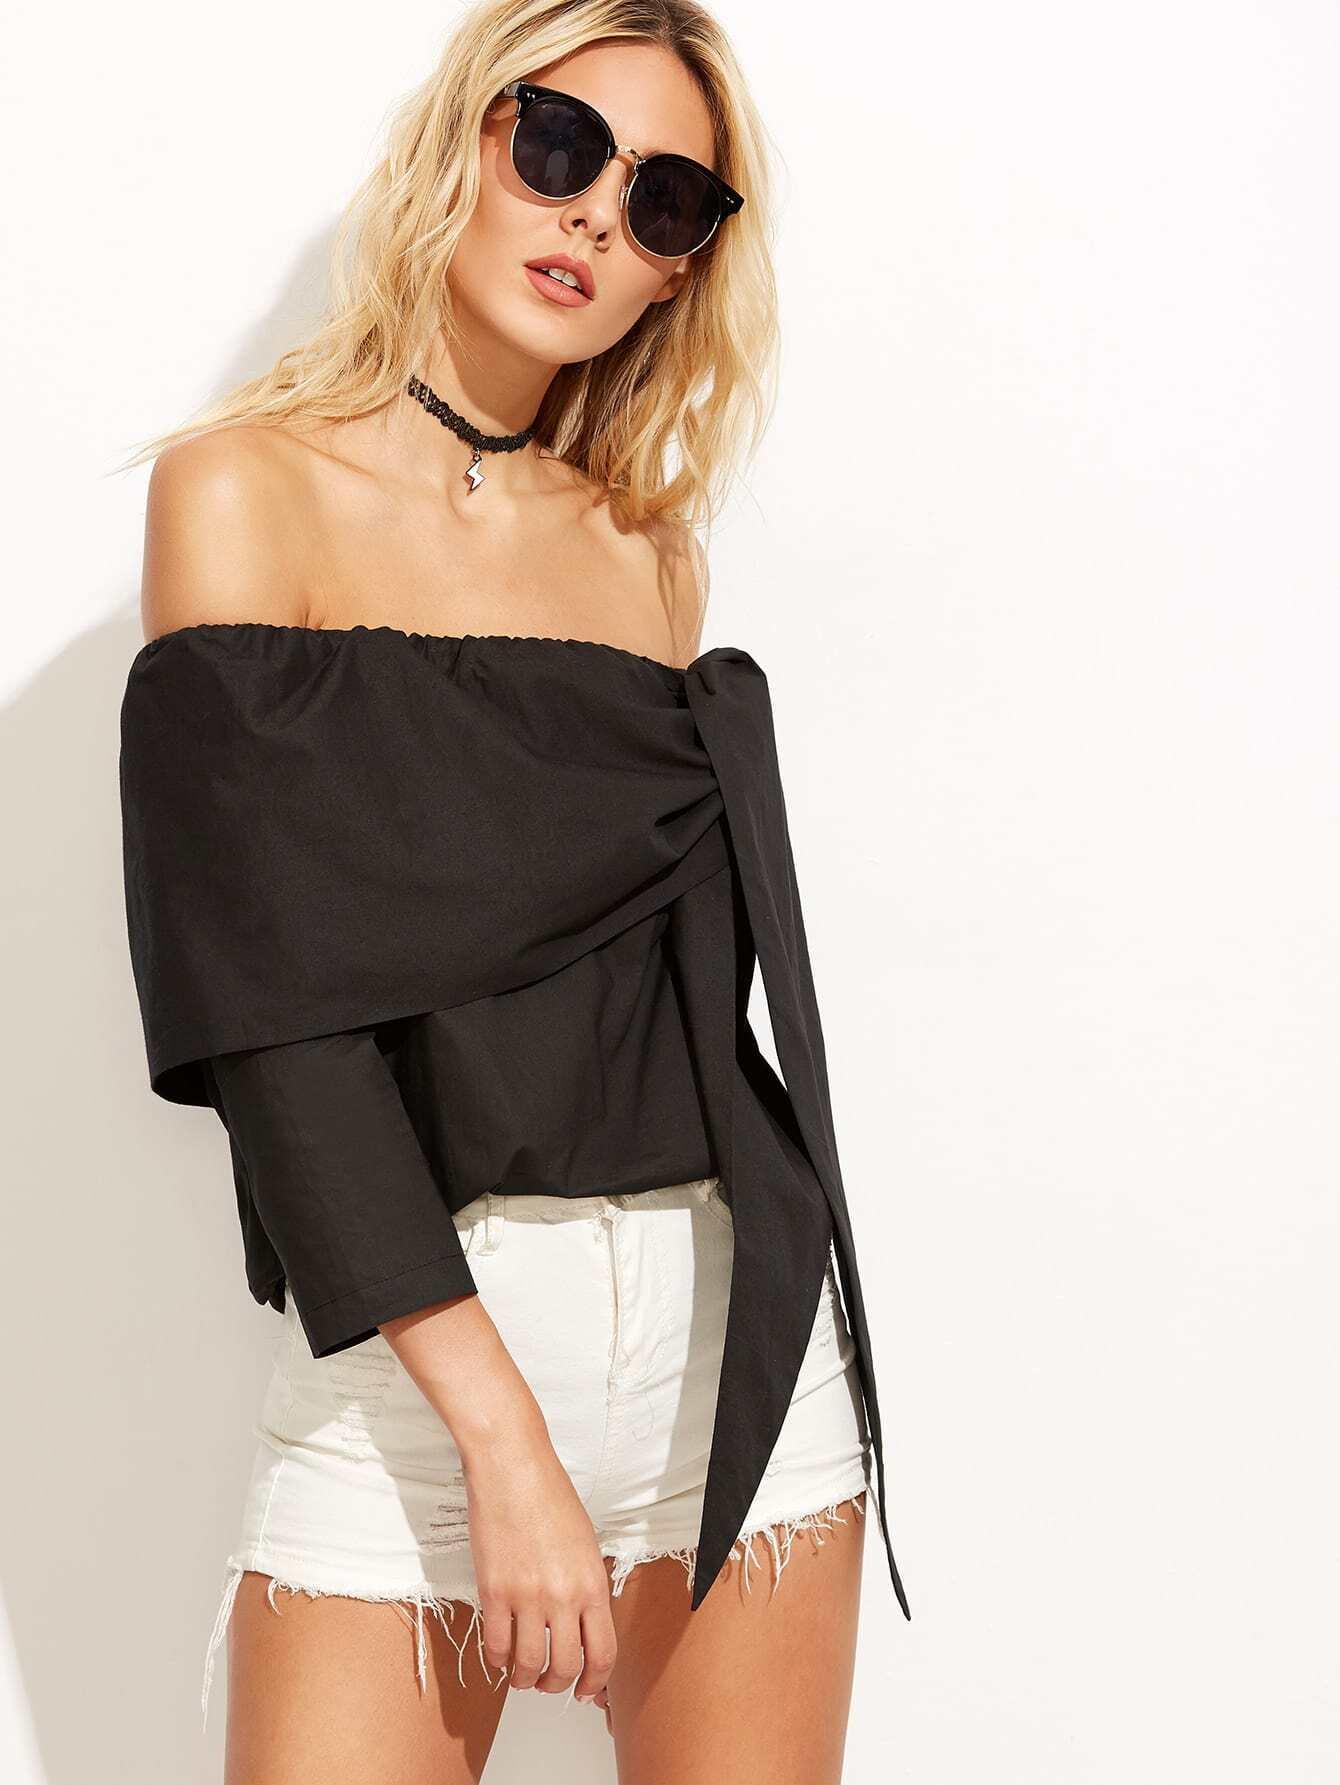 blouse160831501_2